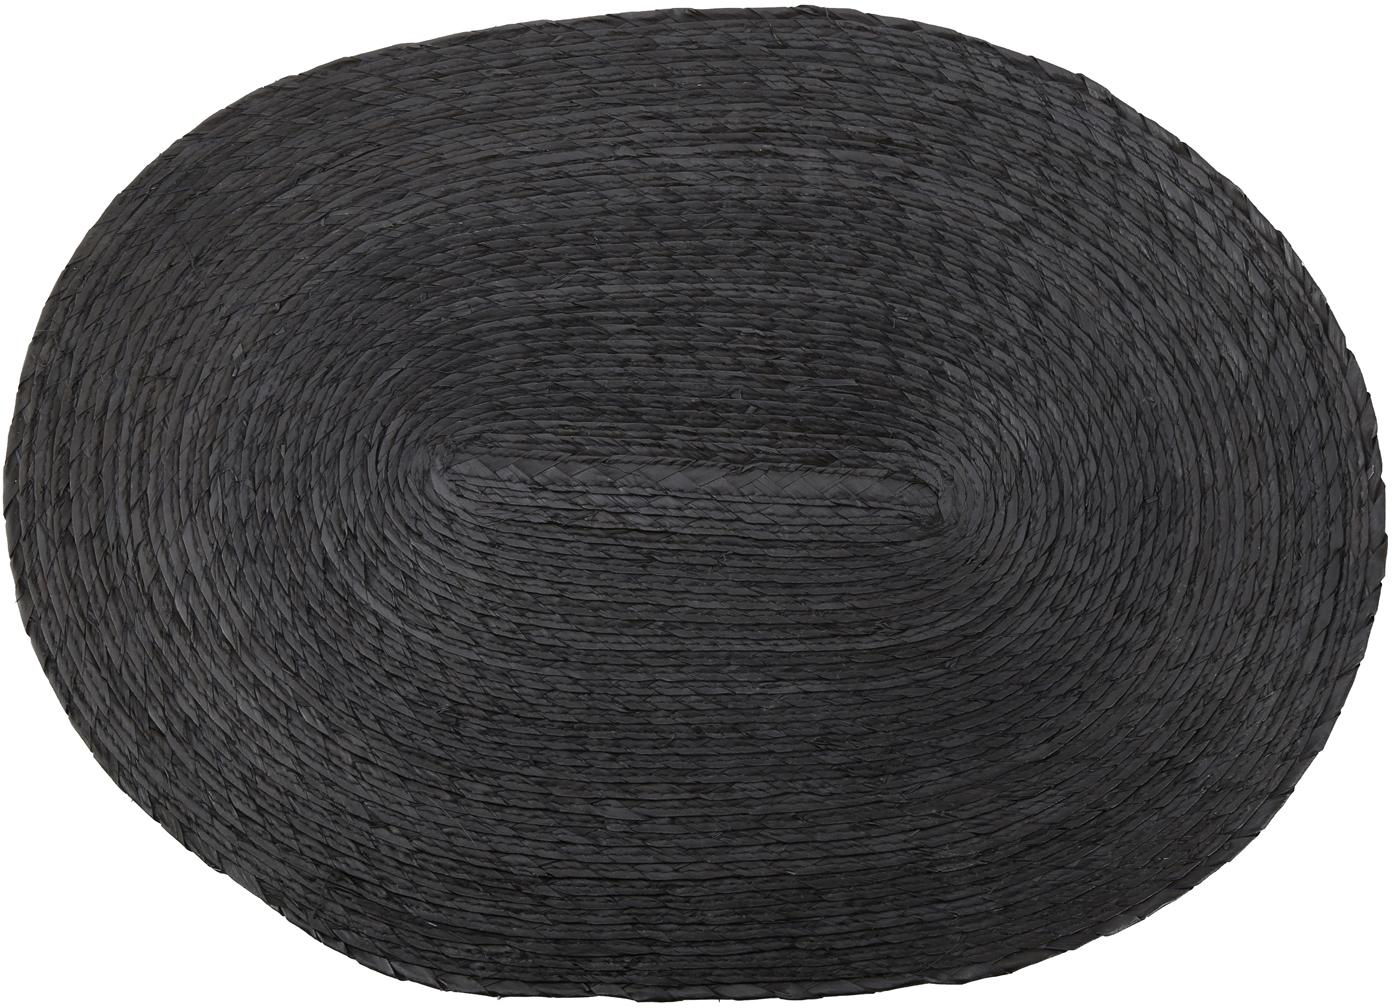 Manteles individuales Mineola, 2uds., Hojas de palmera, Negro, An 33 x L 46 cm